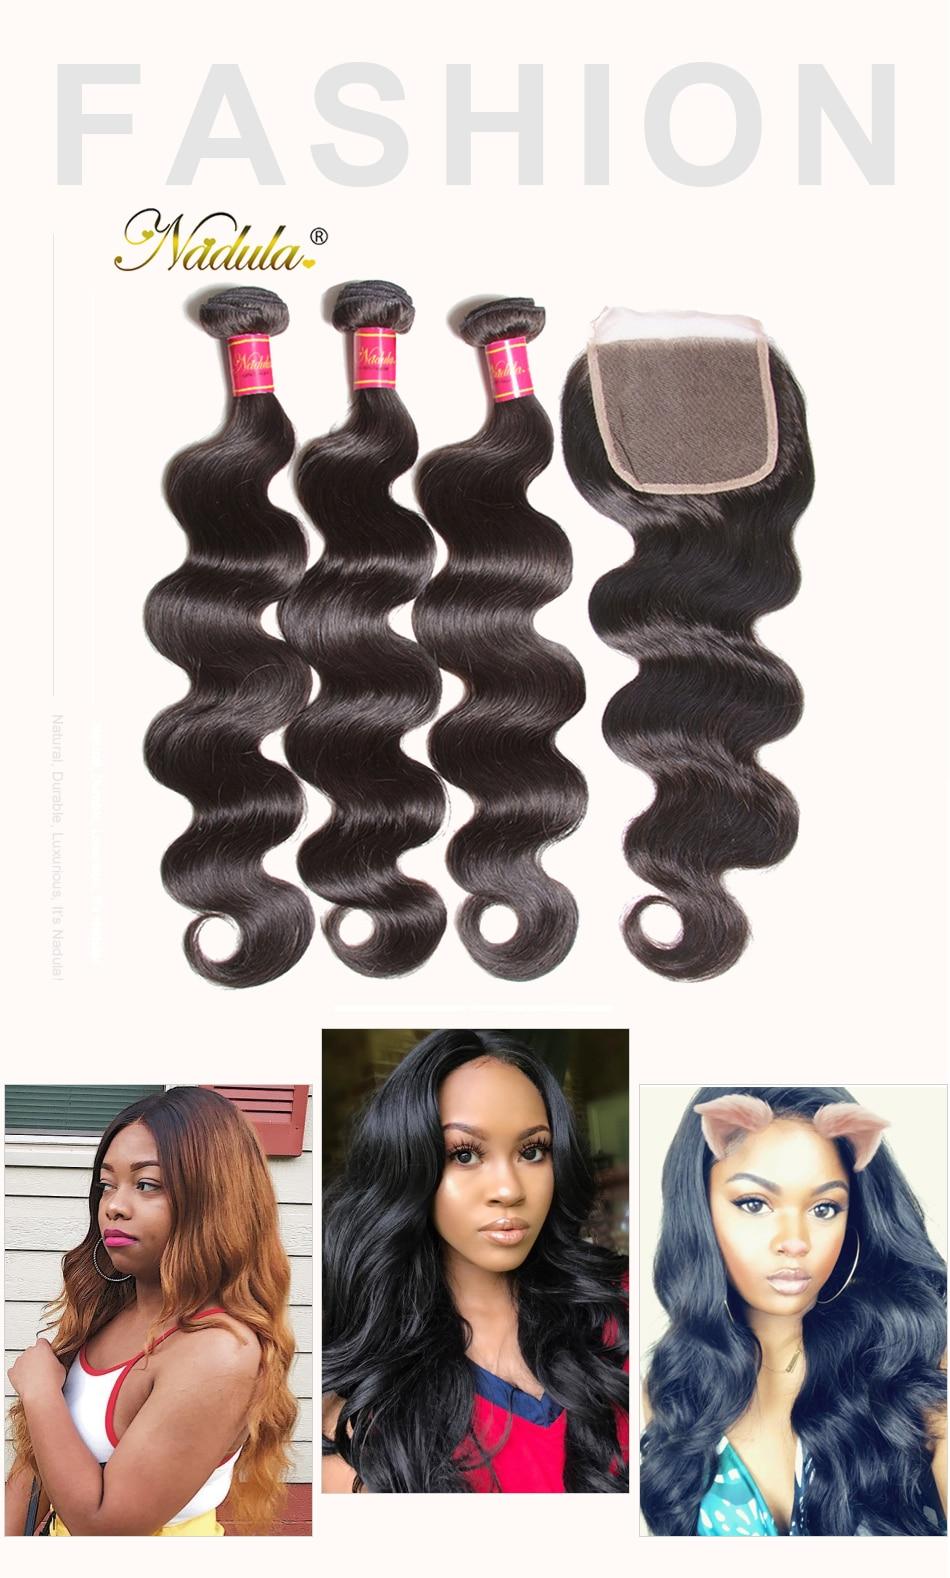 HTB1eRZKaUvrK1RjSspcq6zzSXXaX Nadula Hair Brazilian Body Wave Bundles With Closure 4*4 Lace Closure Brazilian Hair Weave Bundles With Closure Human Remy Hair